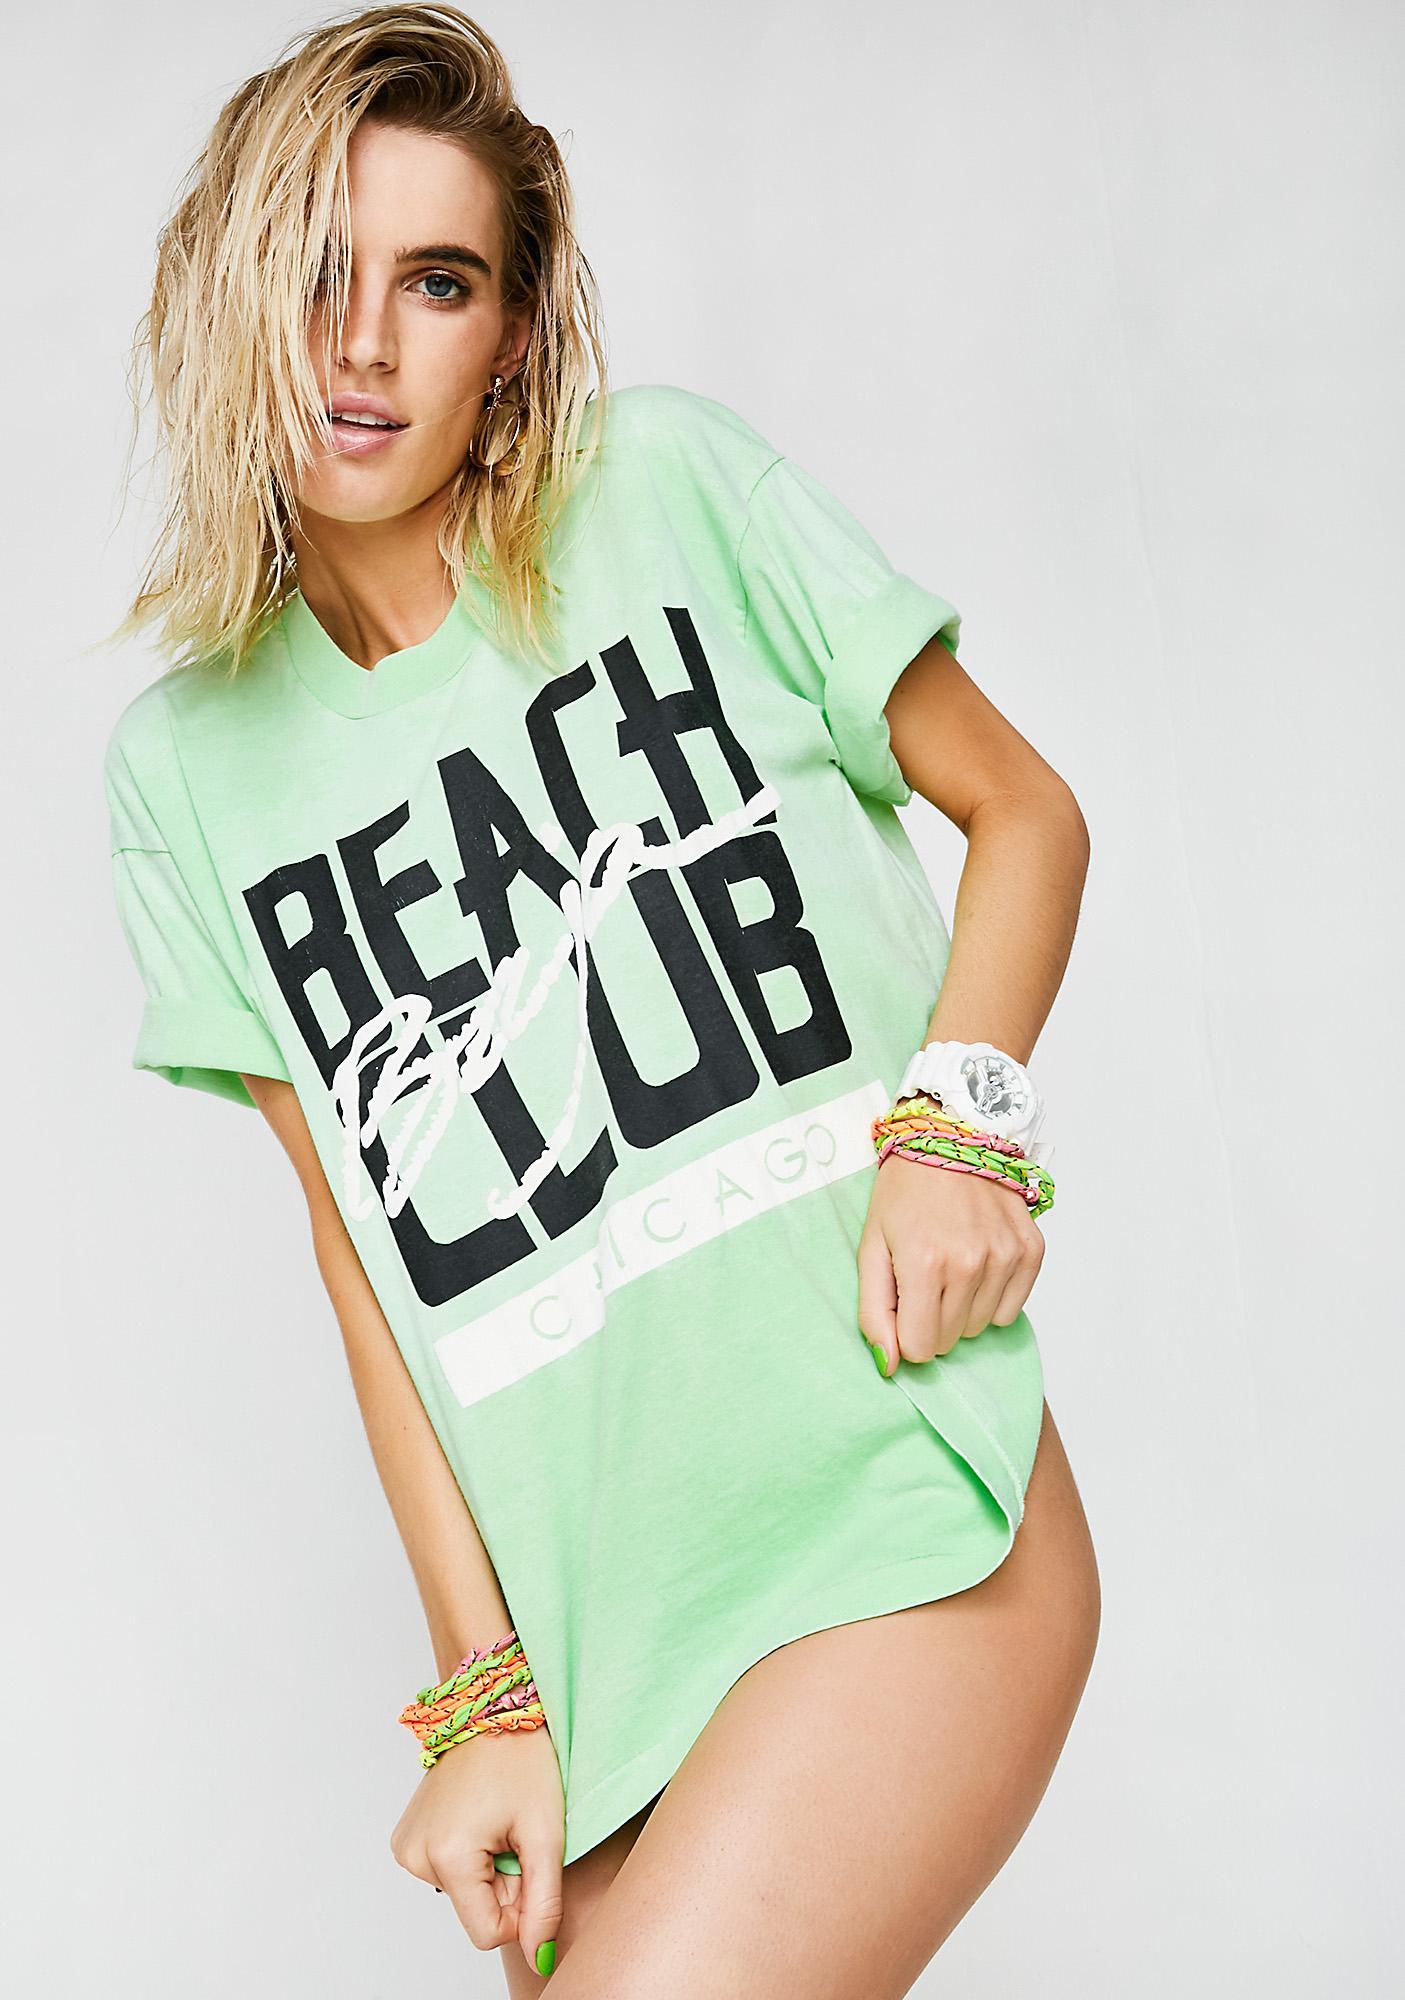 Vintage Chicago Baja Beach Club Tee